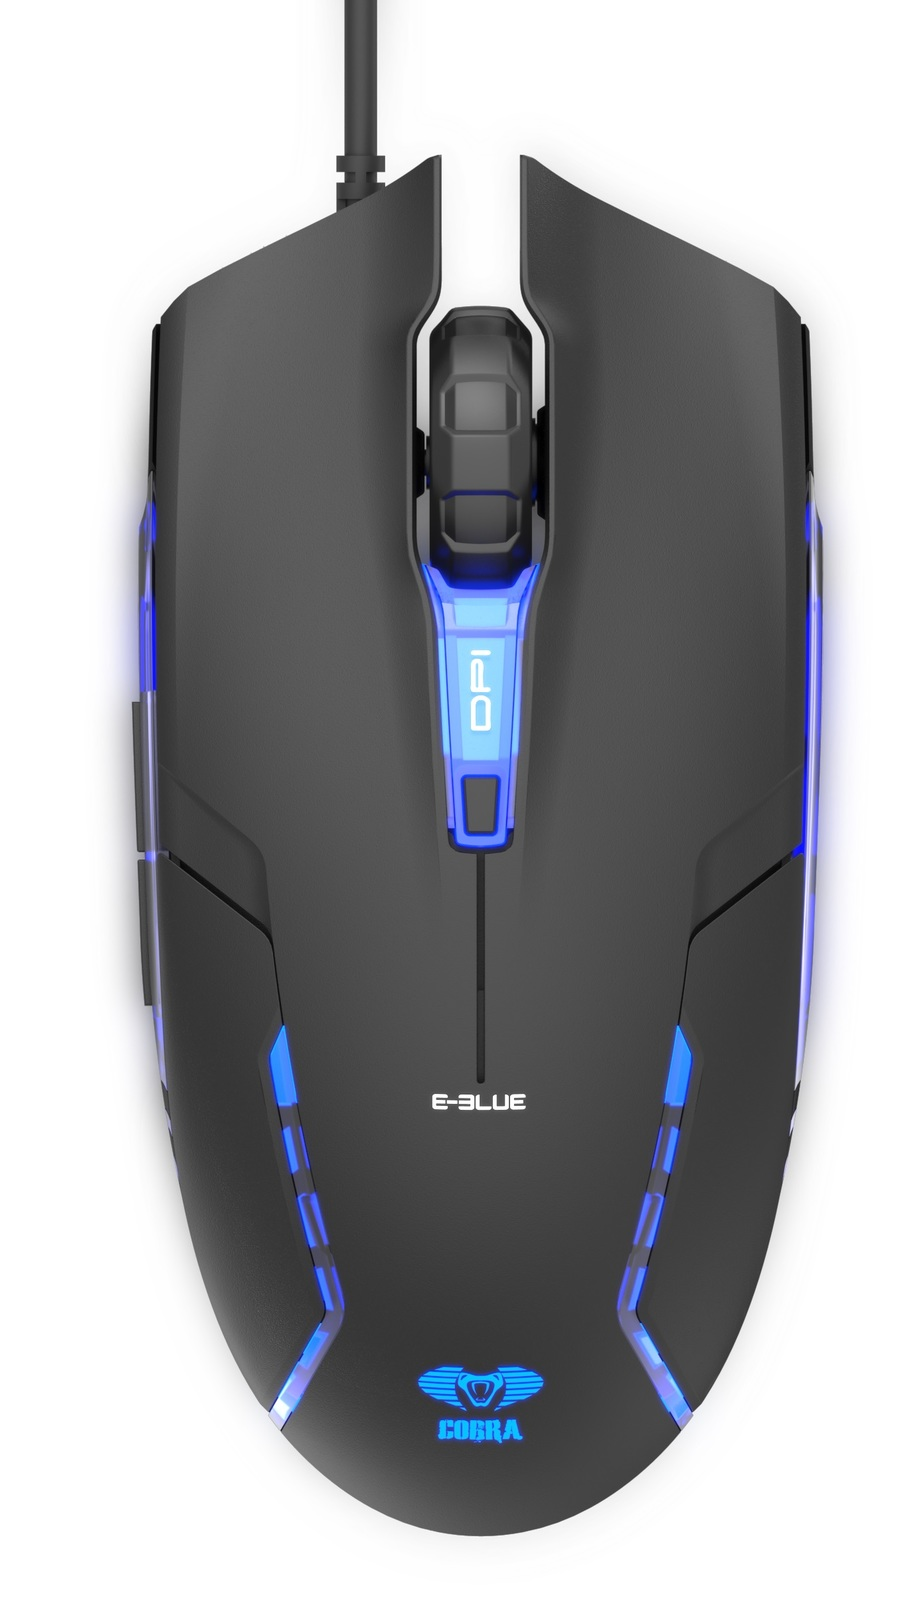 E-Blue Cobra II Gaming Mouse (Black) Screenshots at Mighty